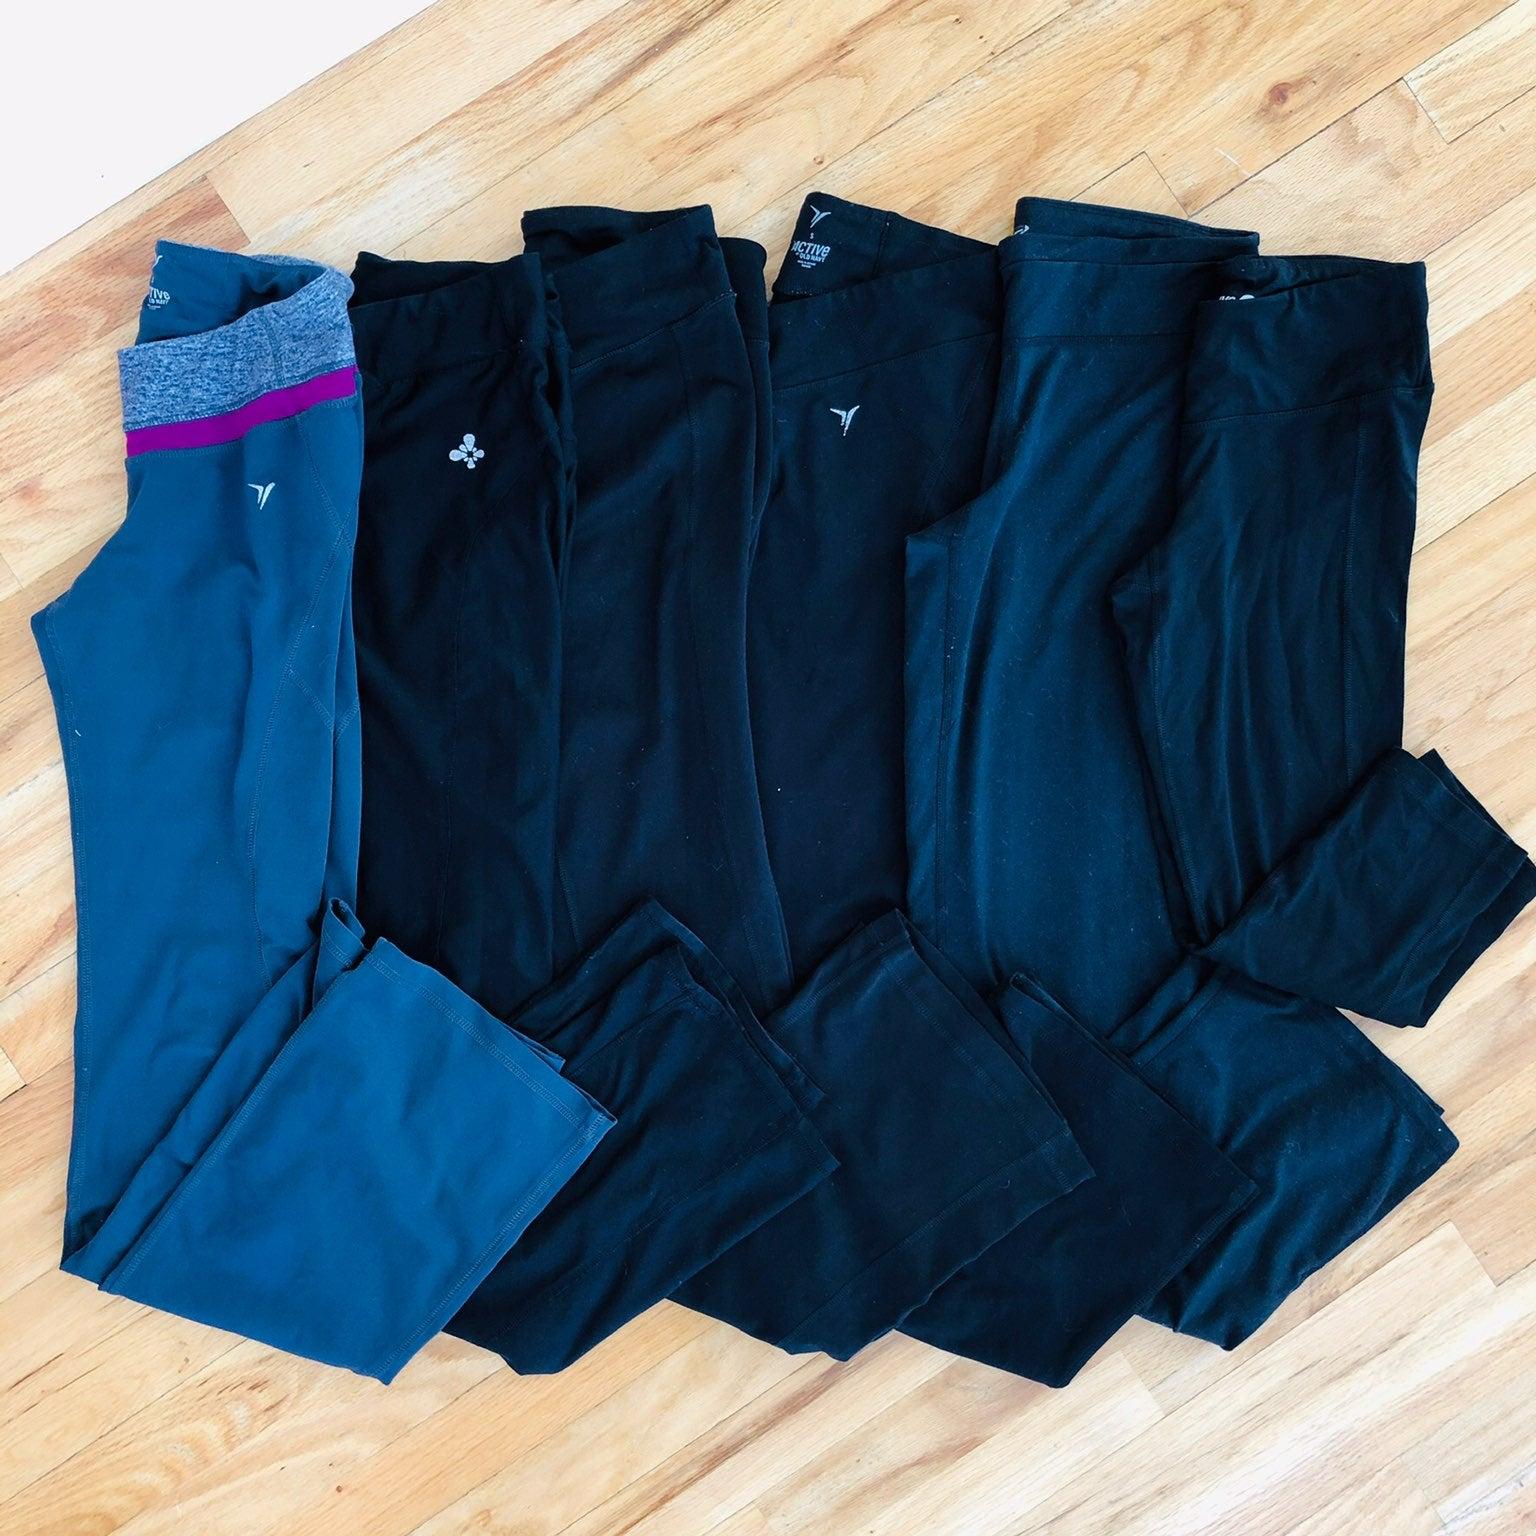 Women's Athletic/Workout Pants Bundle Sm